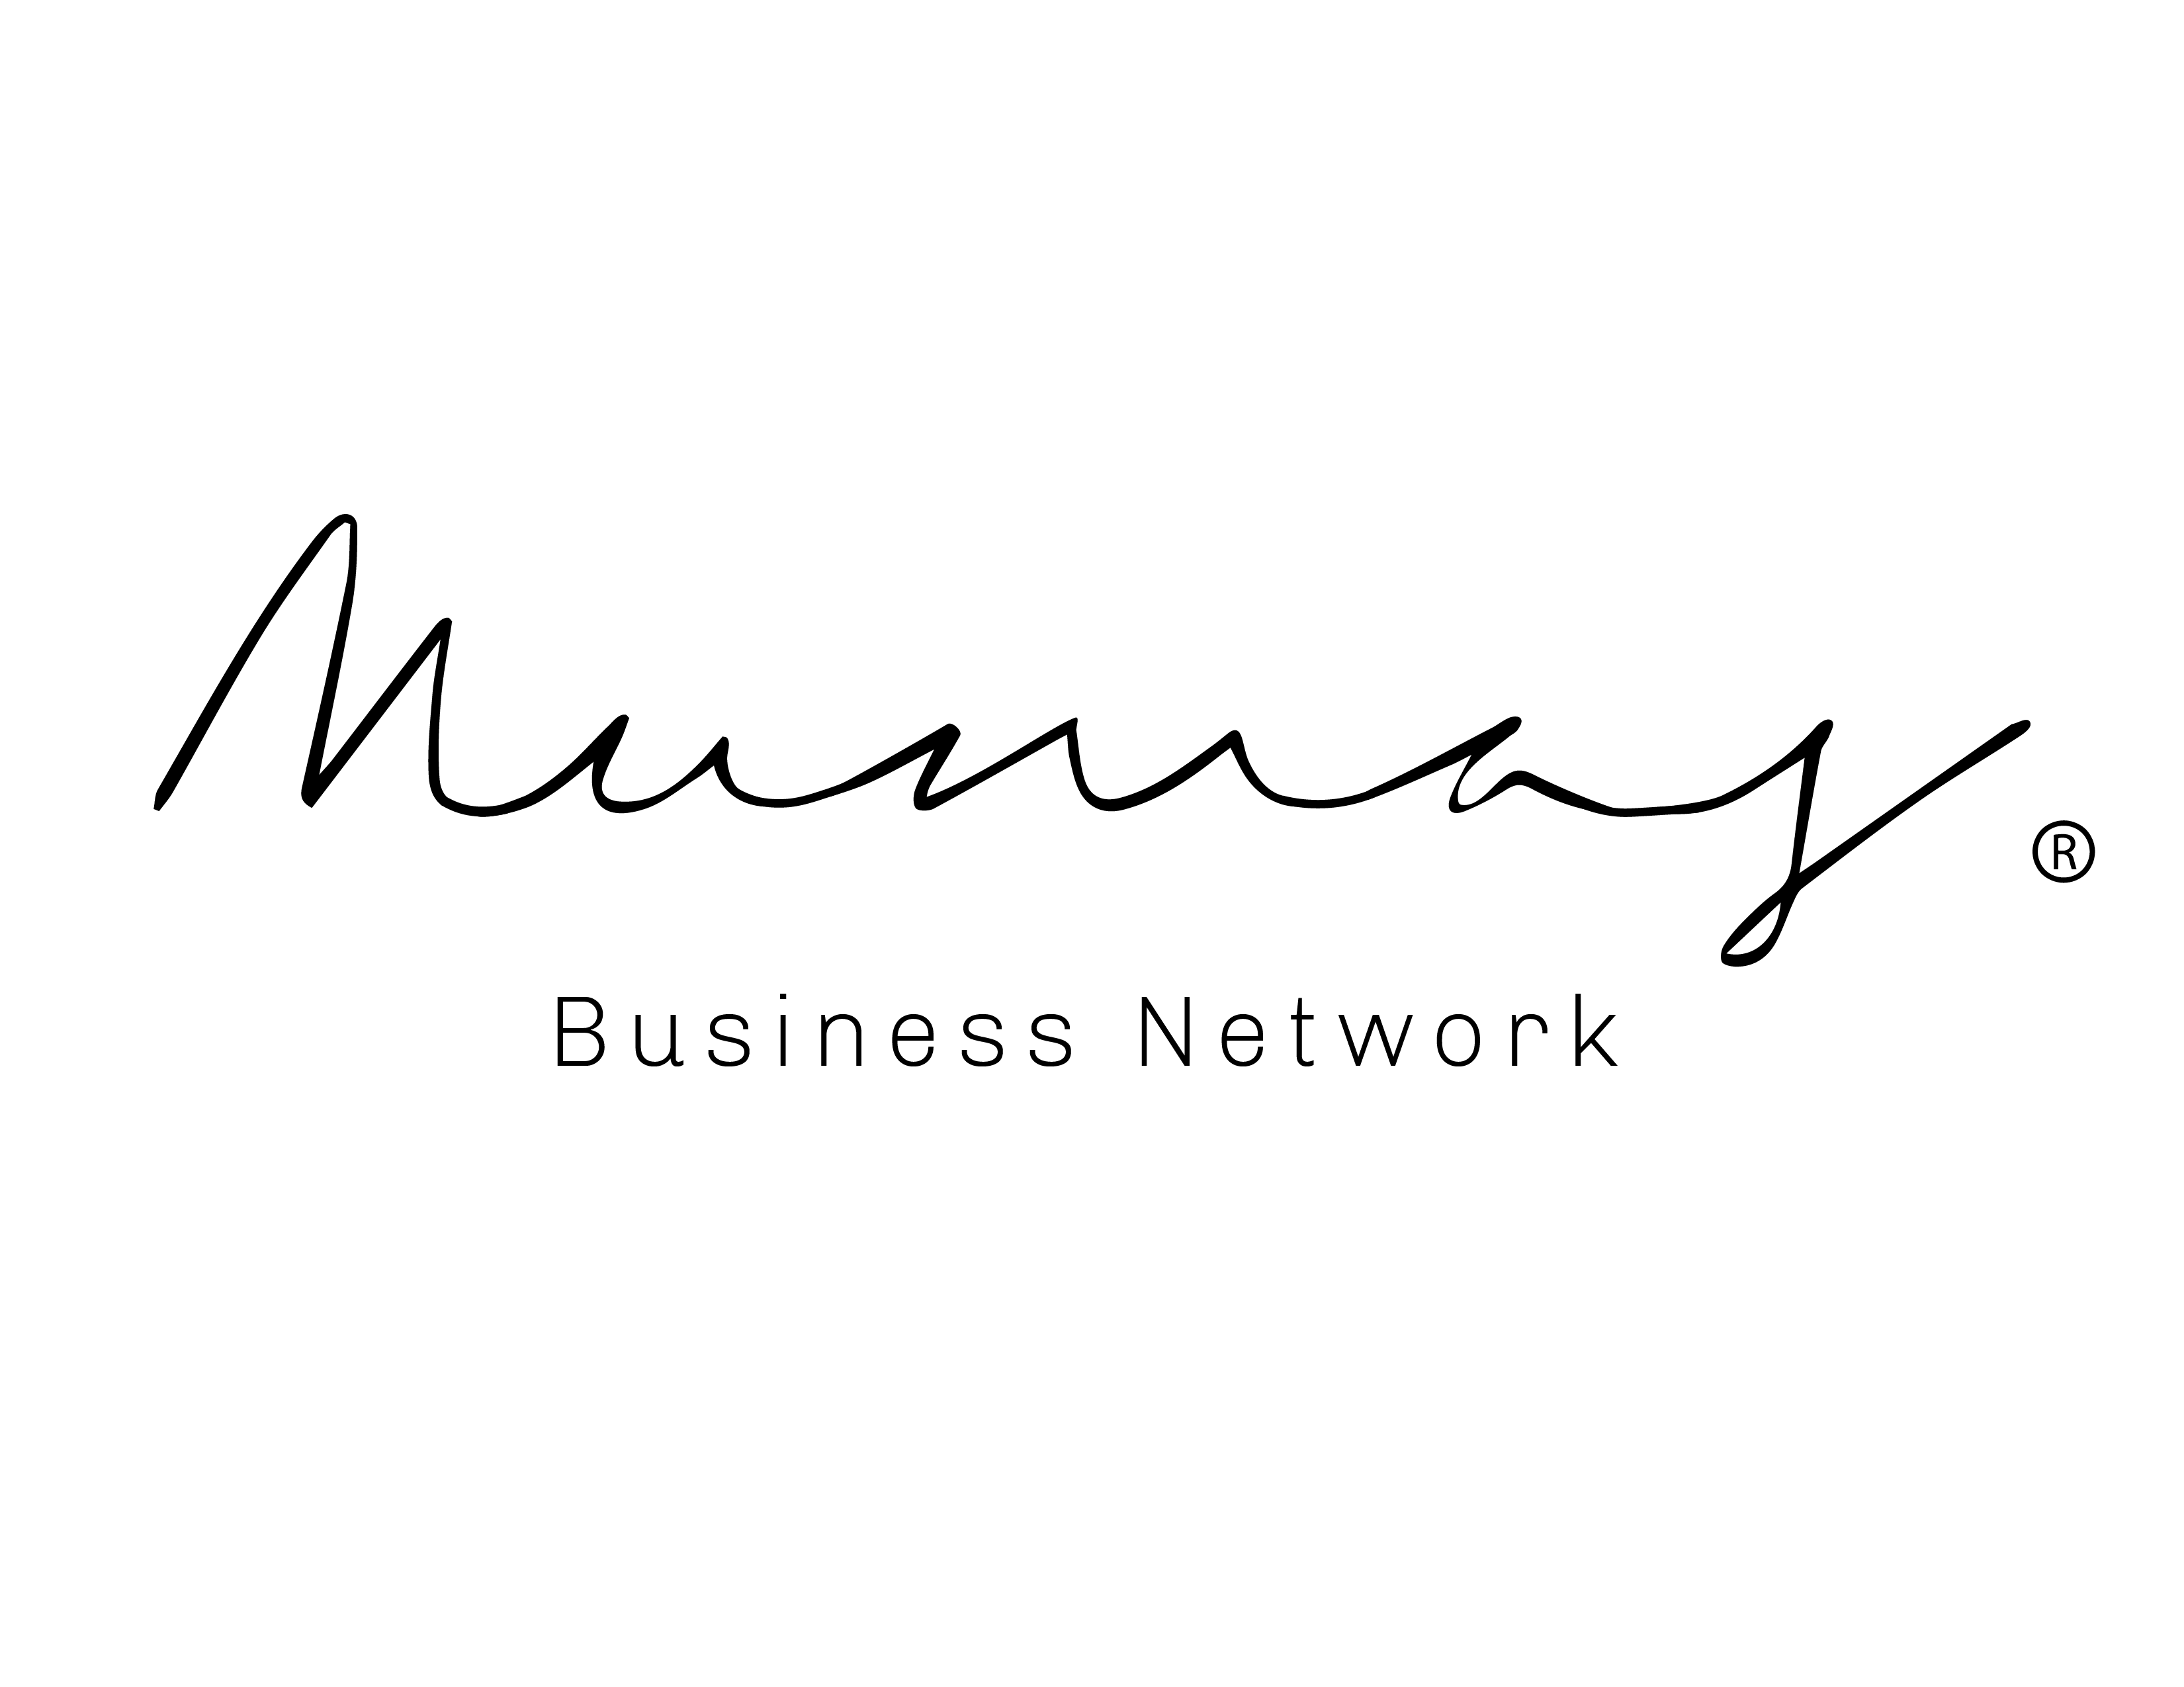 Mumas Business Network